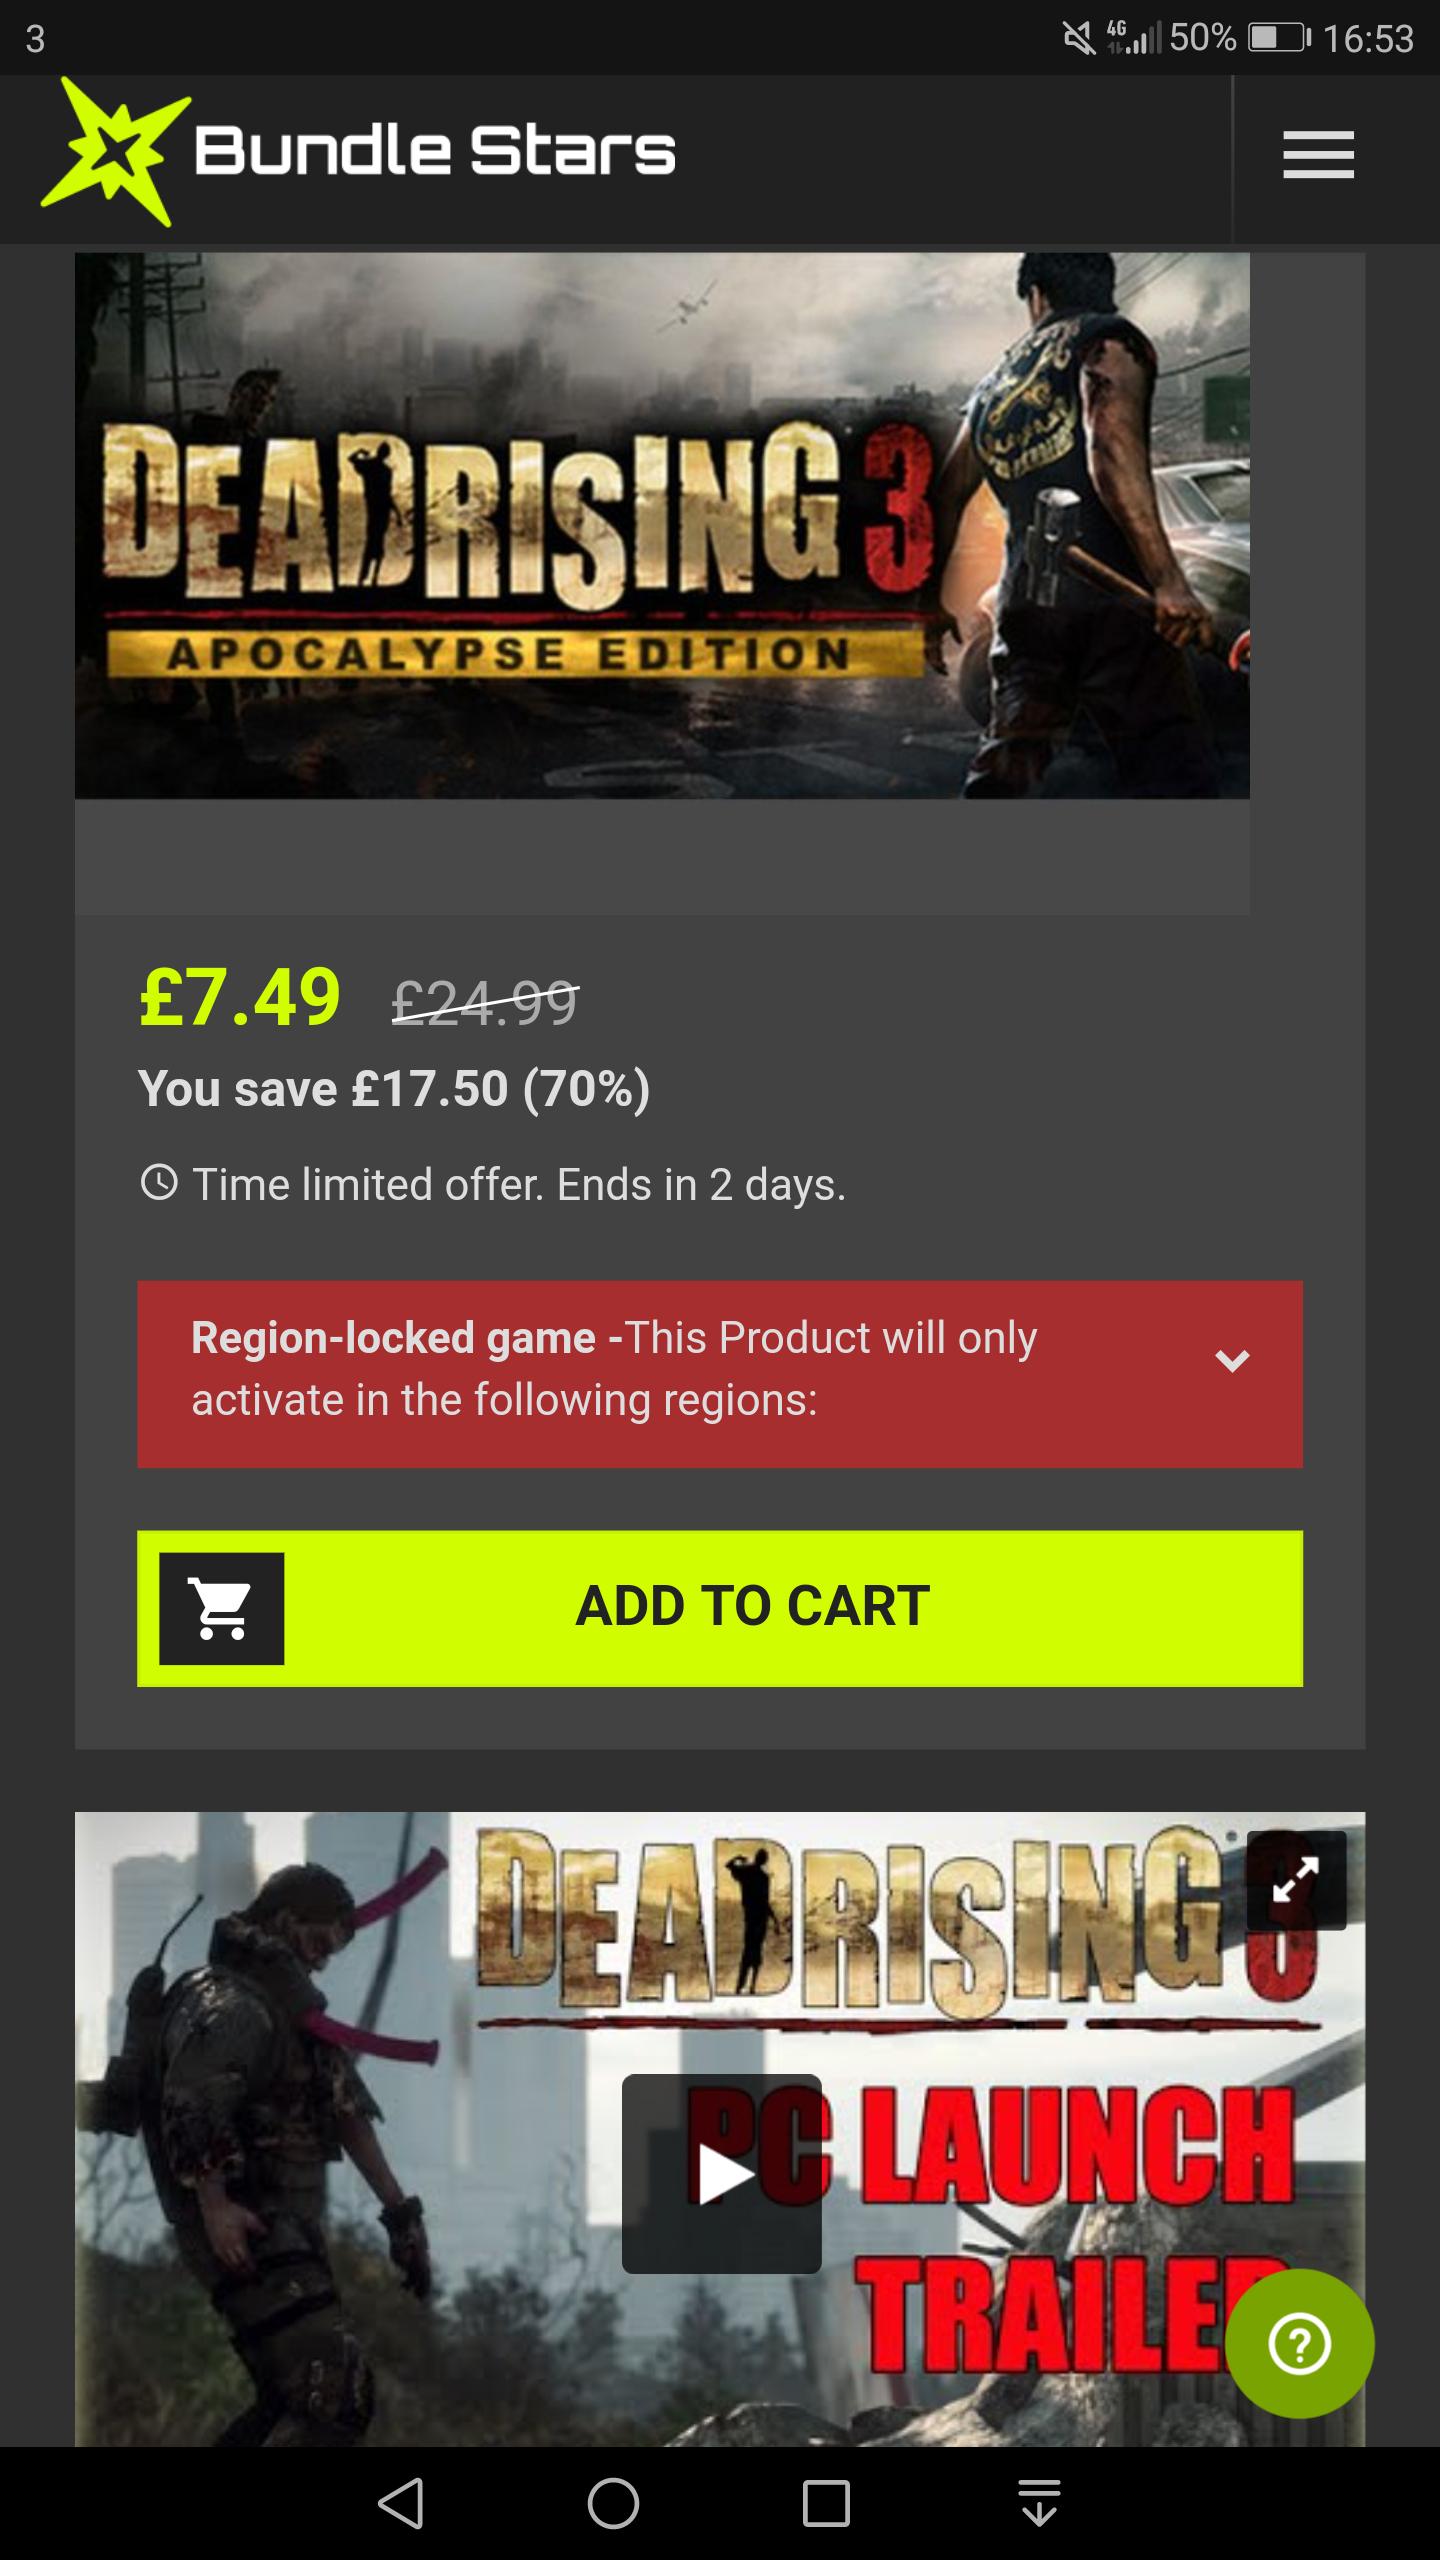 Dead Rising 3 Apocalypse Edition (Includes DLC) - £7.49 (70% Off) at Bundlestars - Steam